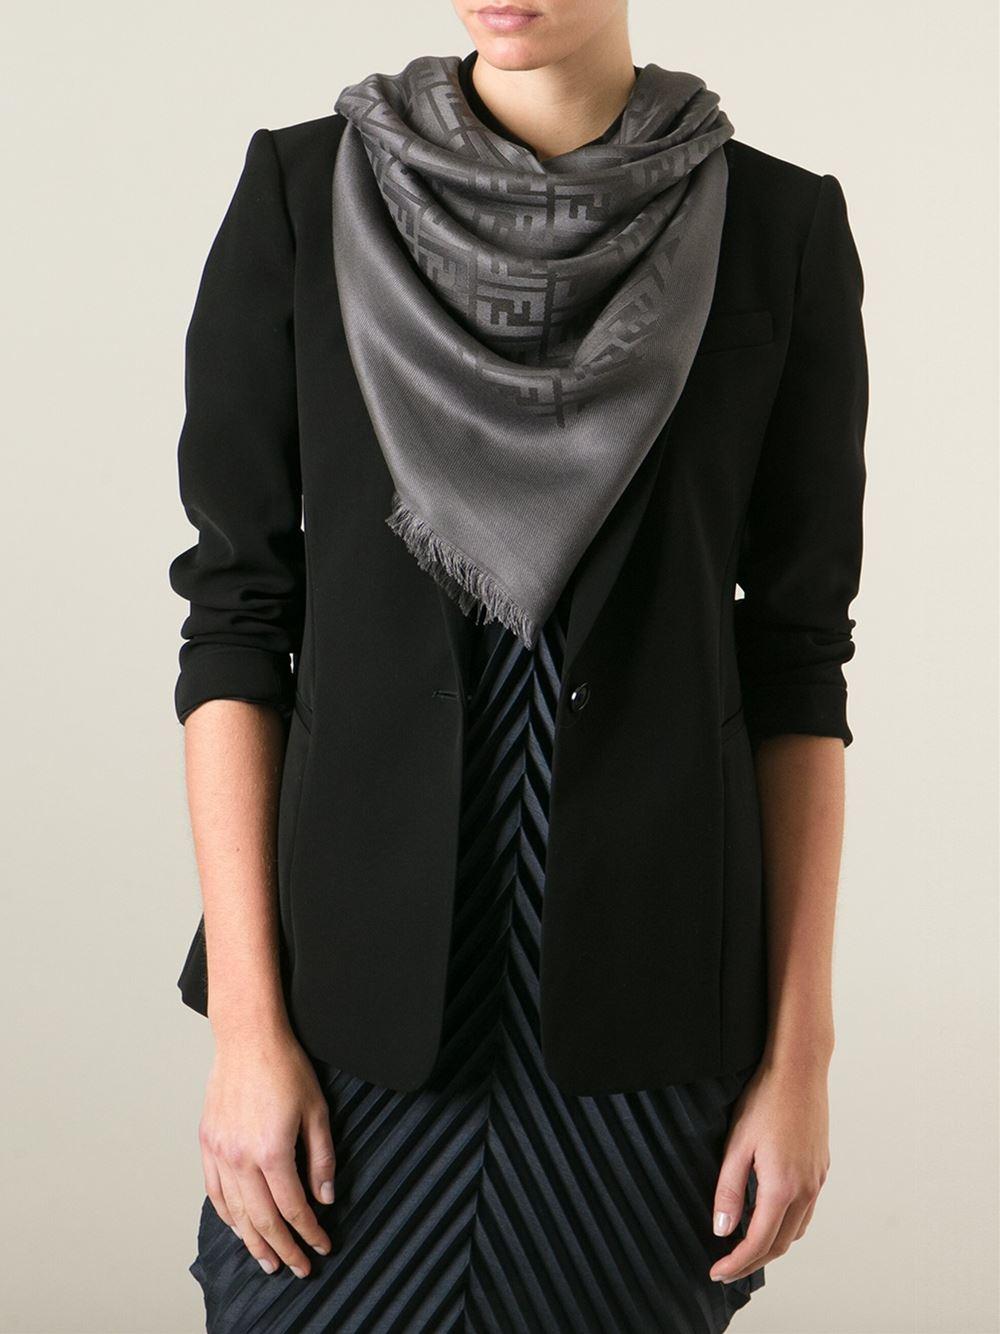 445ecf7f536 switzerland lyst fendi ff logo scarf in gray 0beed 71c19